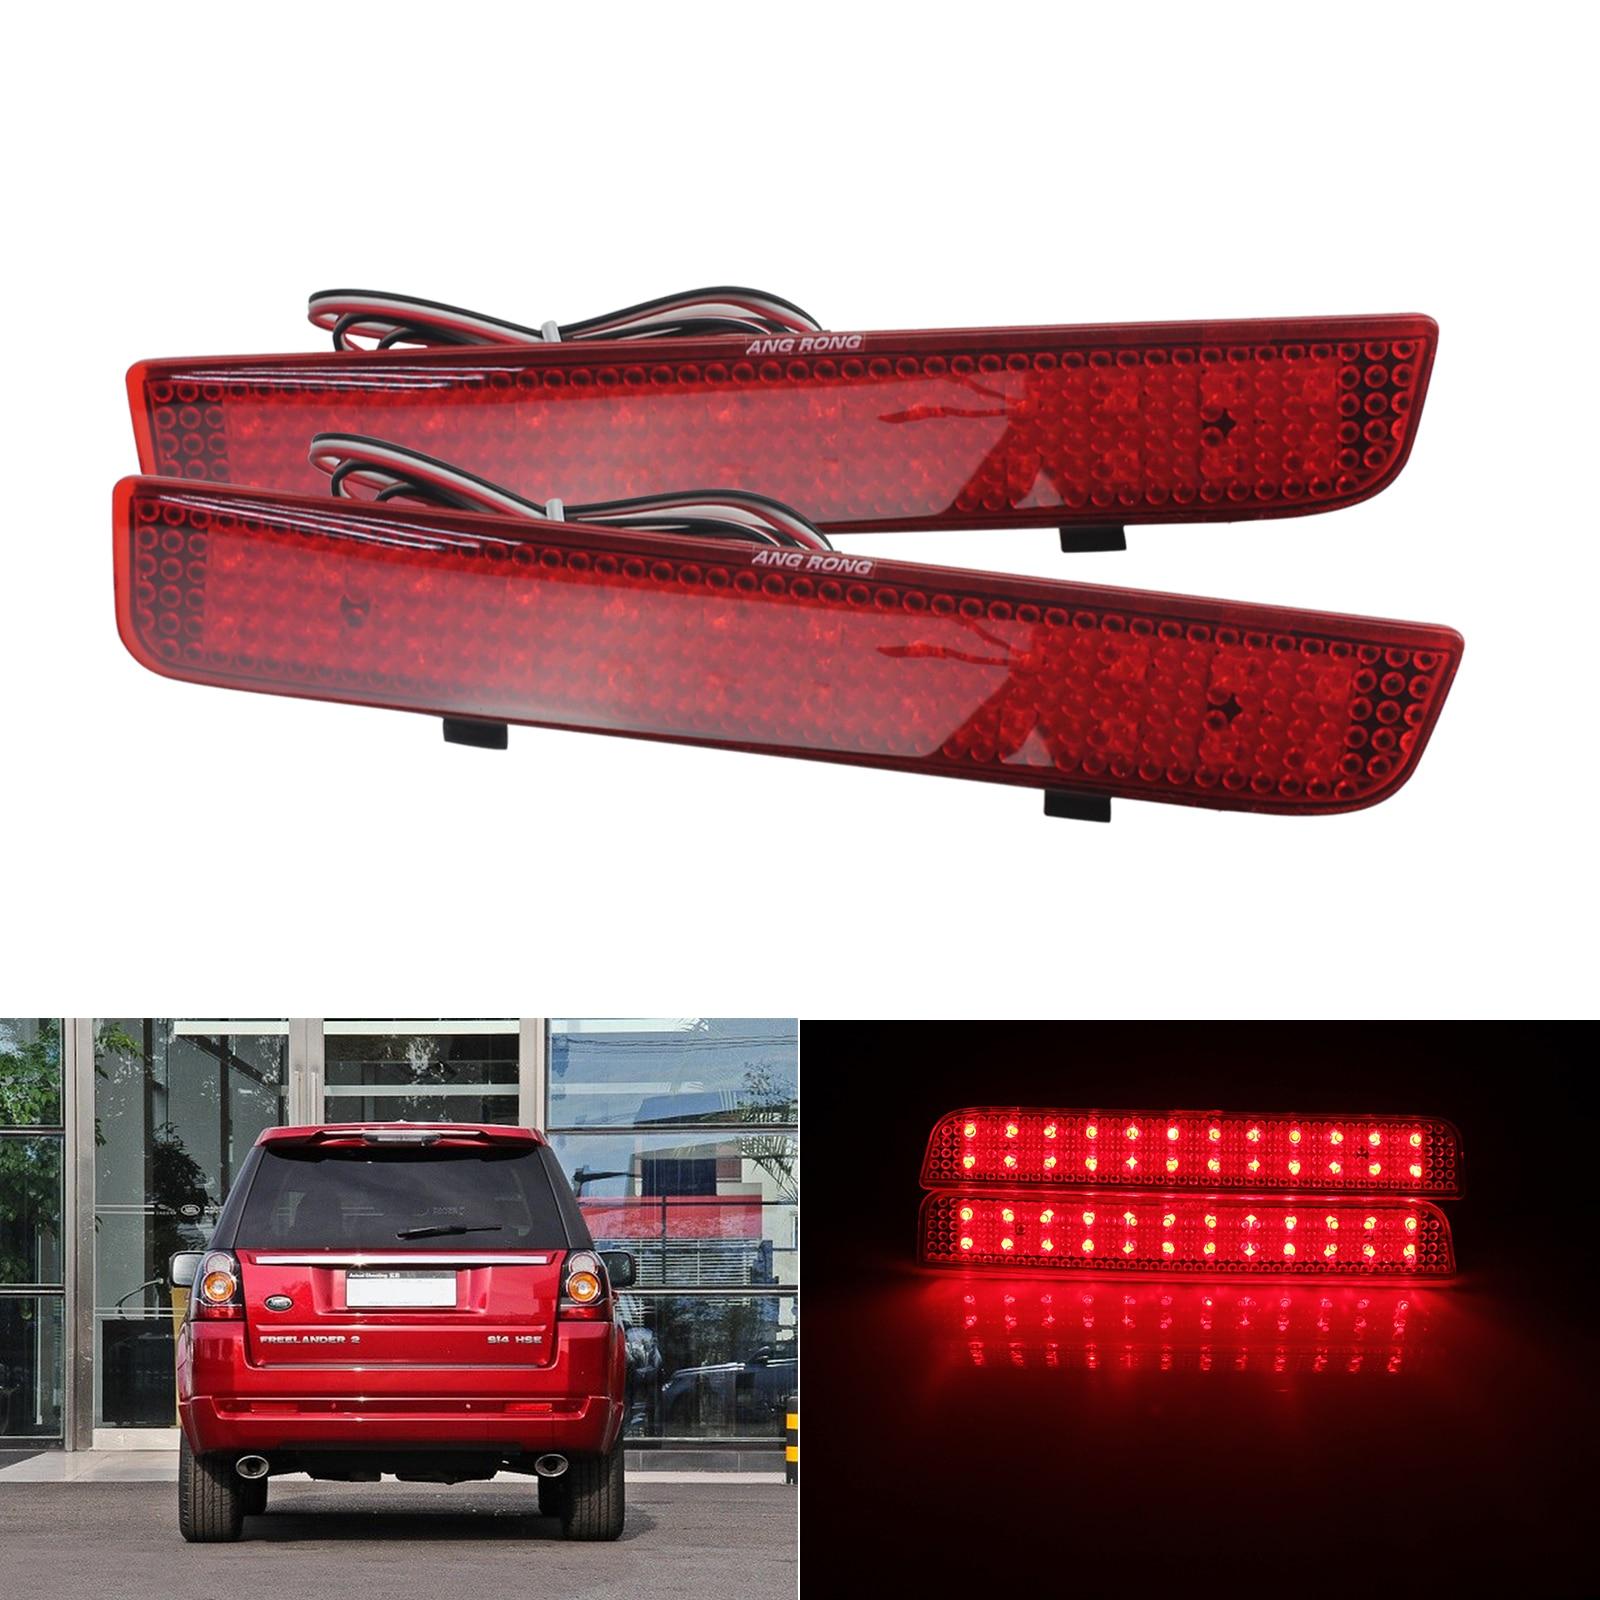 Rear Light Clear//Red 2005-2009 NS Left lamp nearside N//S for Range Rover L322